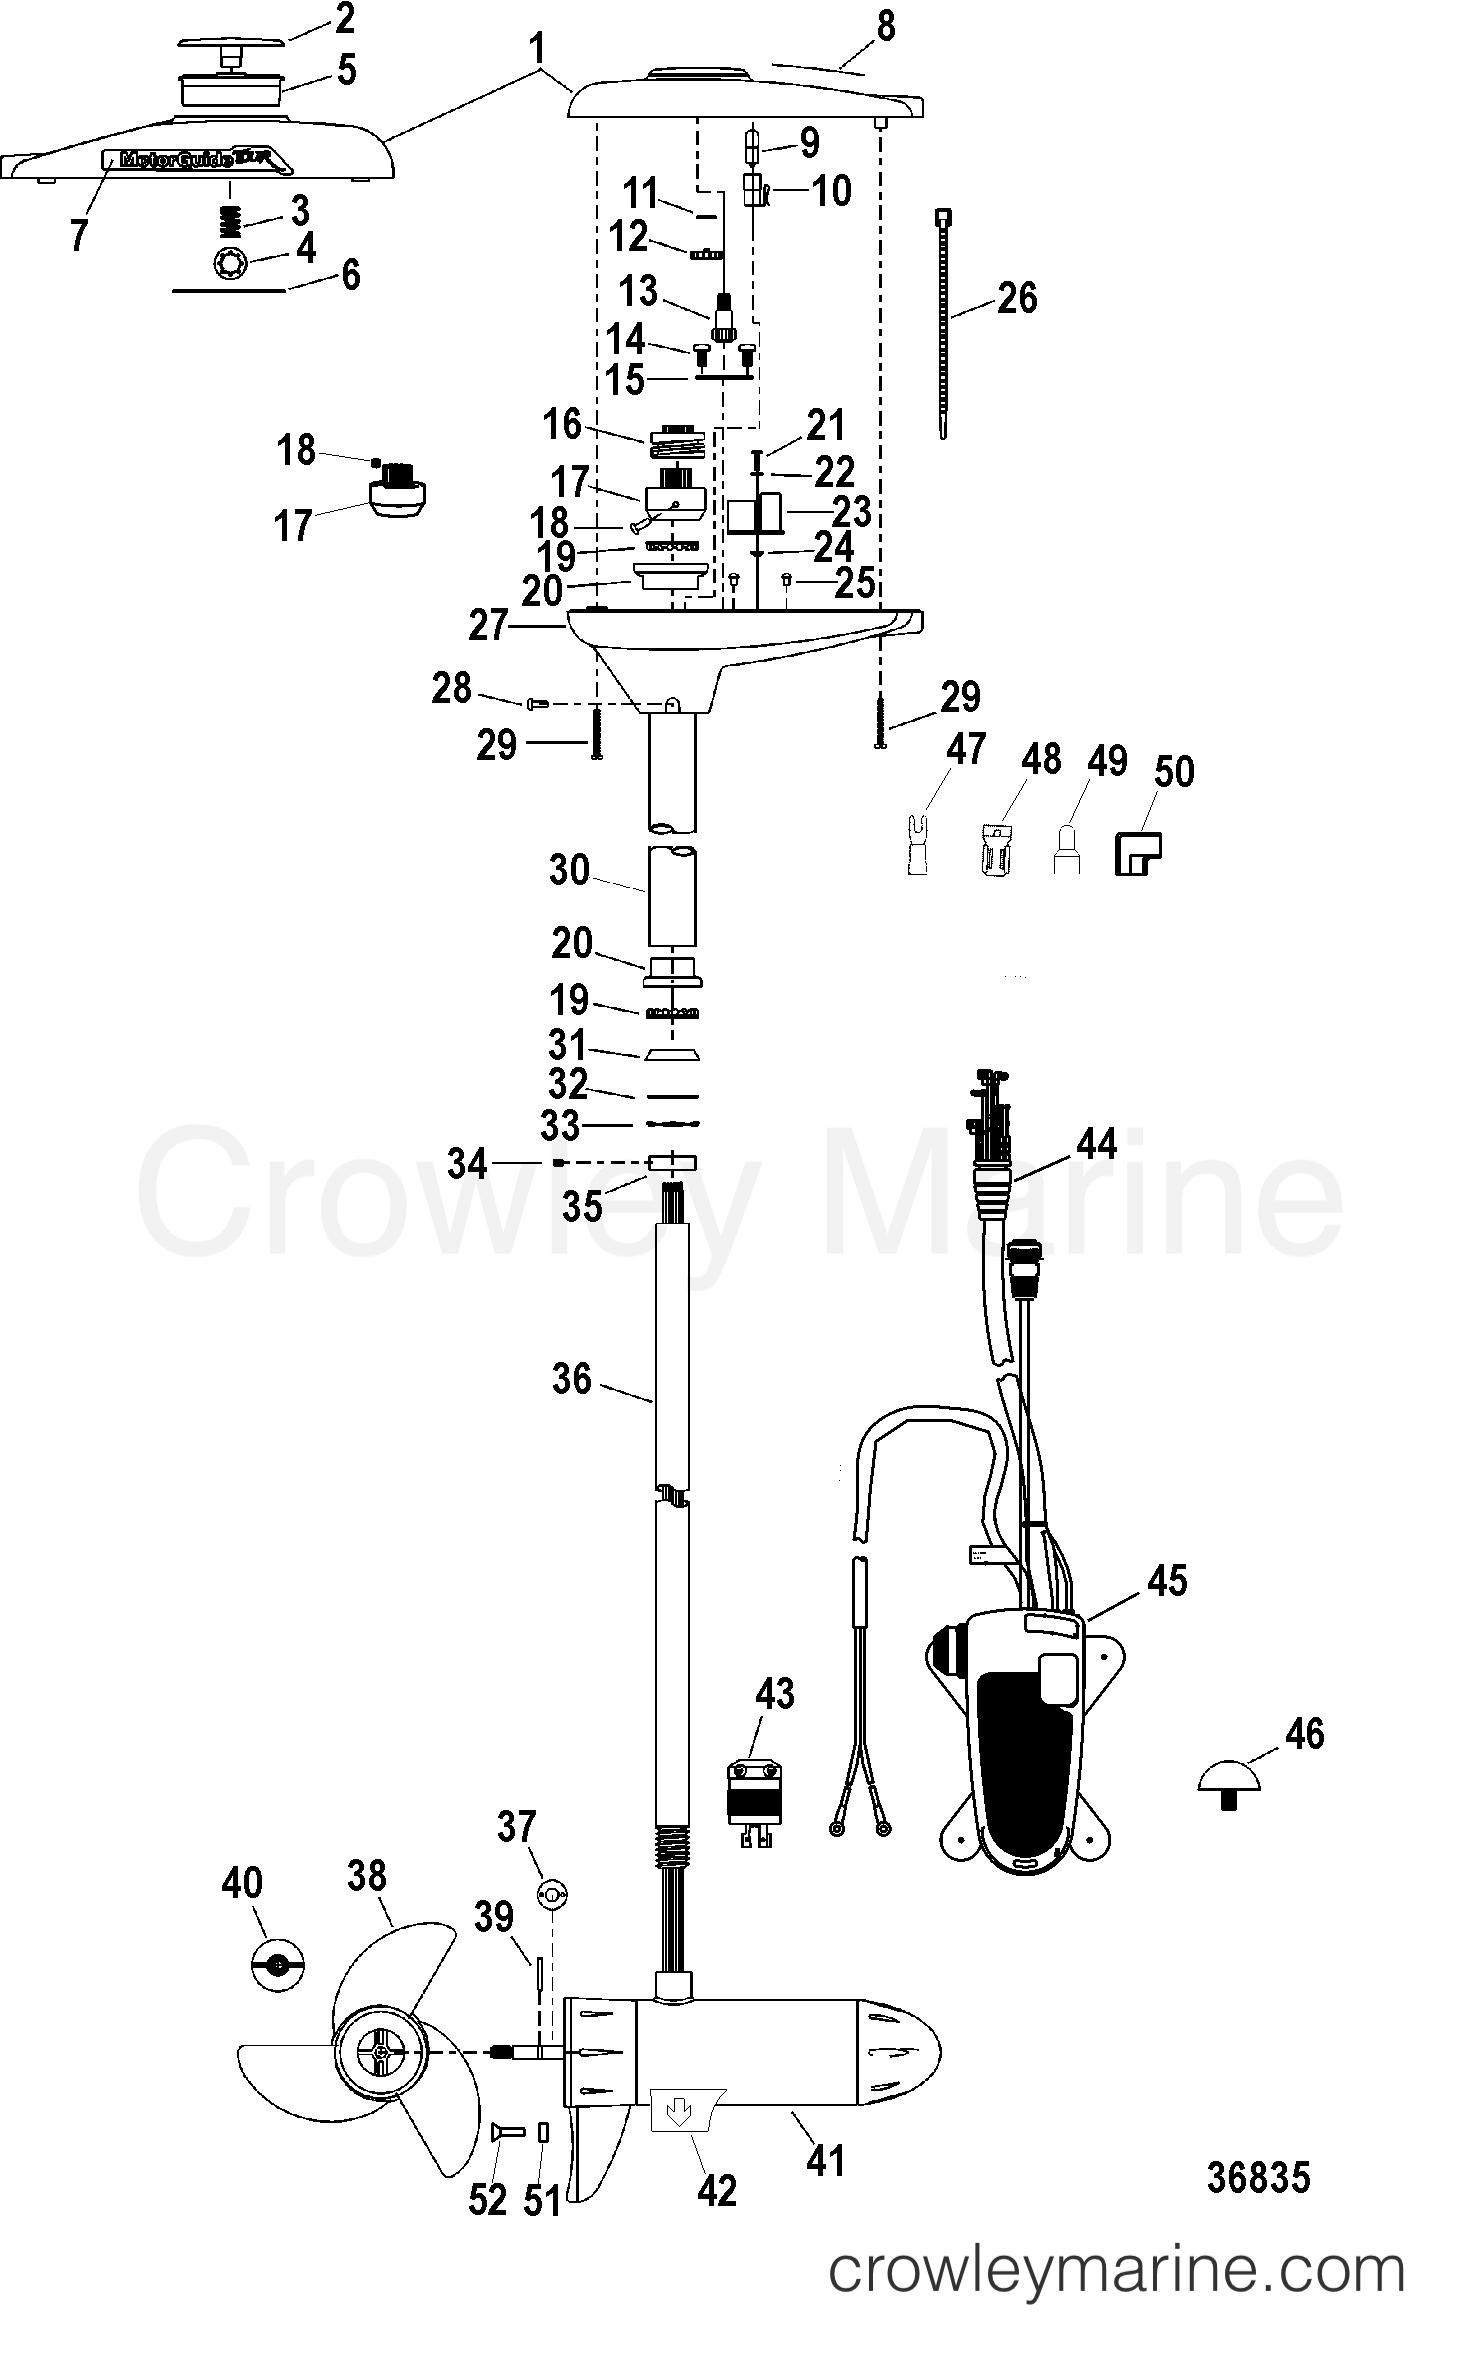 COMPLETE TROLLING MOTOR(TR82PFB / TR82PFBD) (24 VOLT